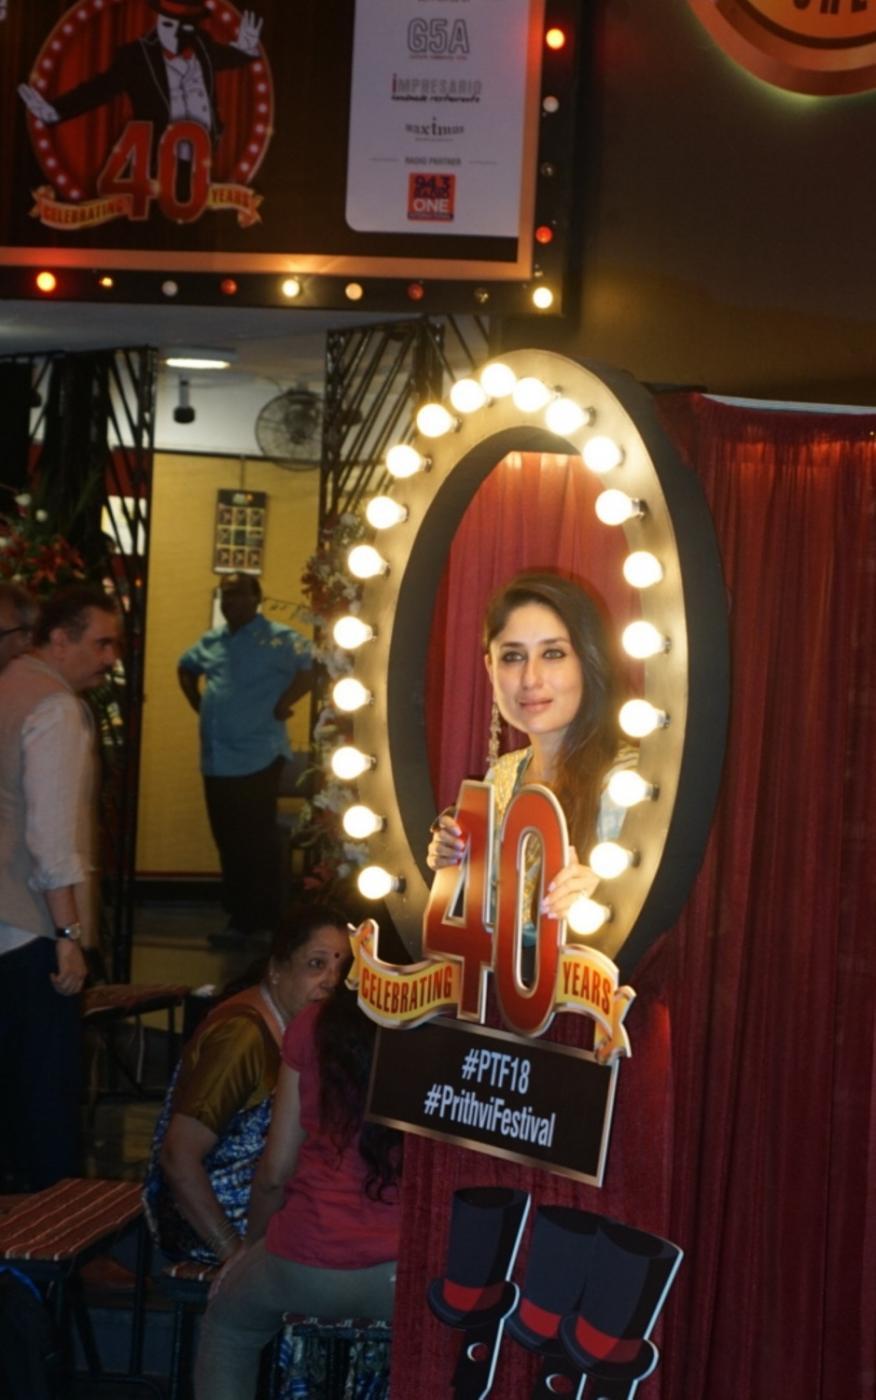 Mumbai: Actress Kareena Kapoor Khan at the 40th anniversary celebration of the Prithvi Theatre in Mumbai on Nov 5, 2018. (Photo: IANS) by .